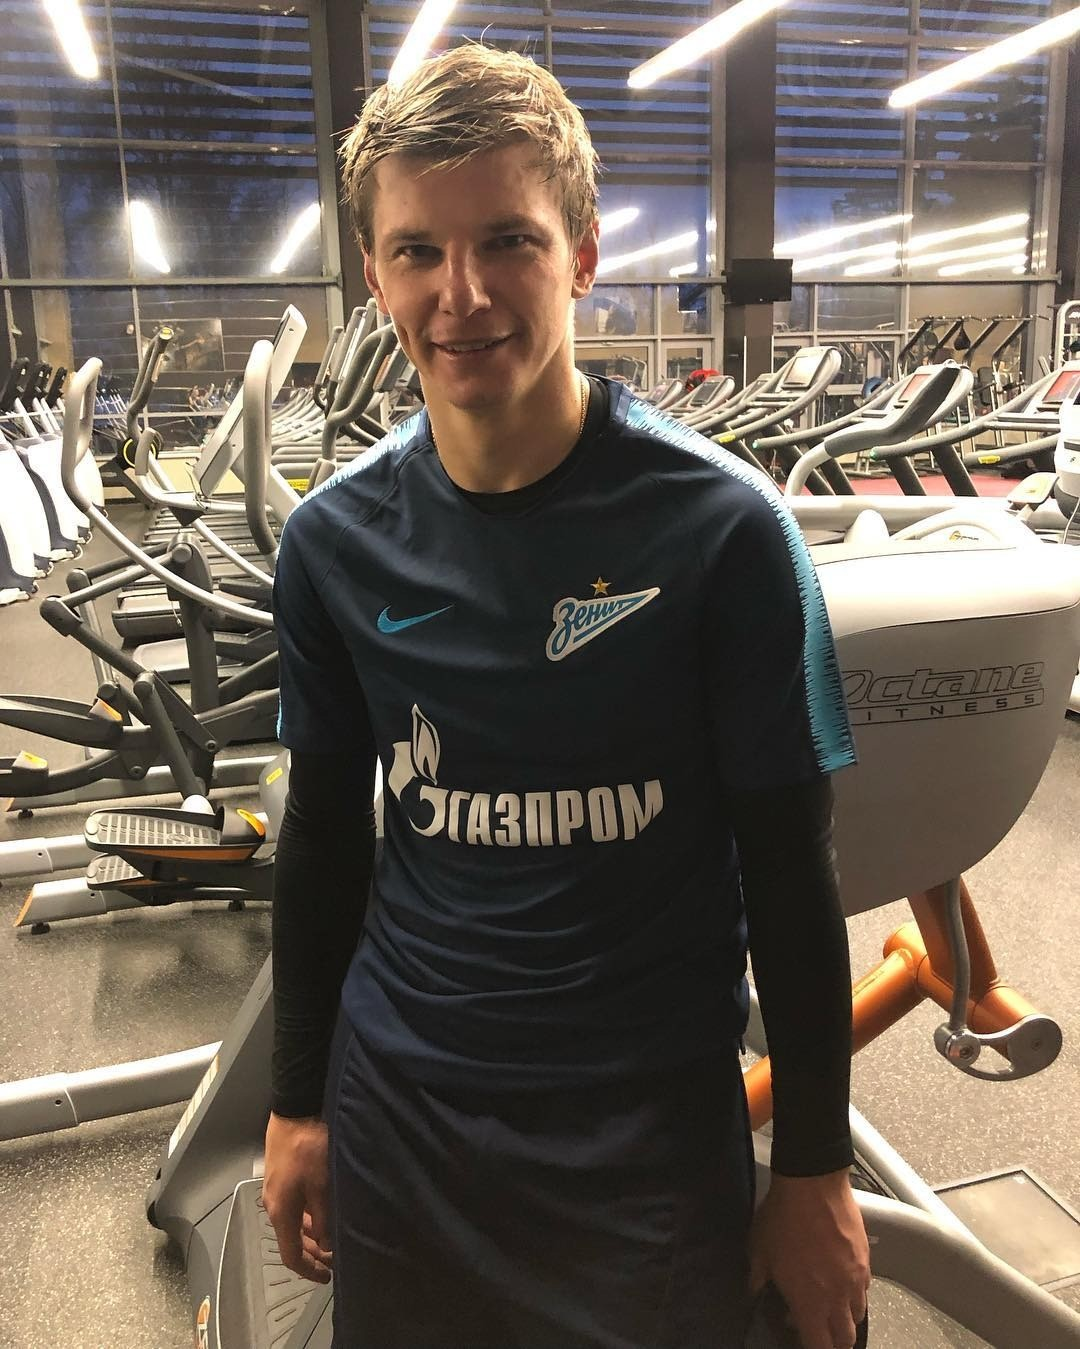 Жена Аршавина подала на футболиста заявление в полицию